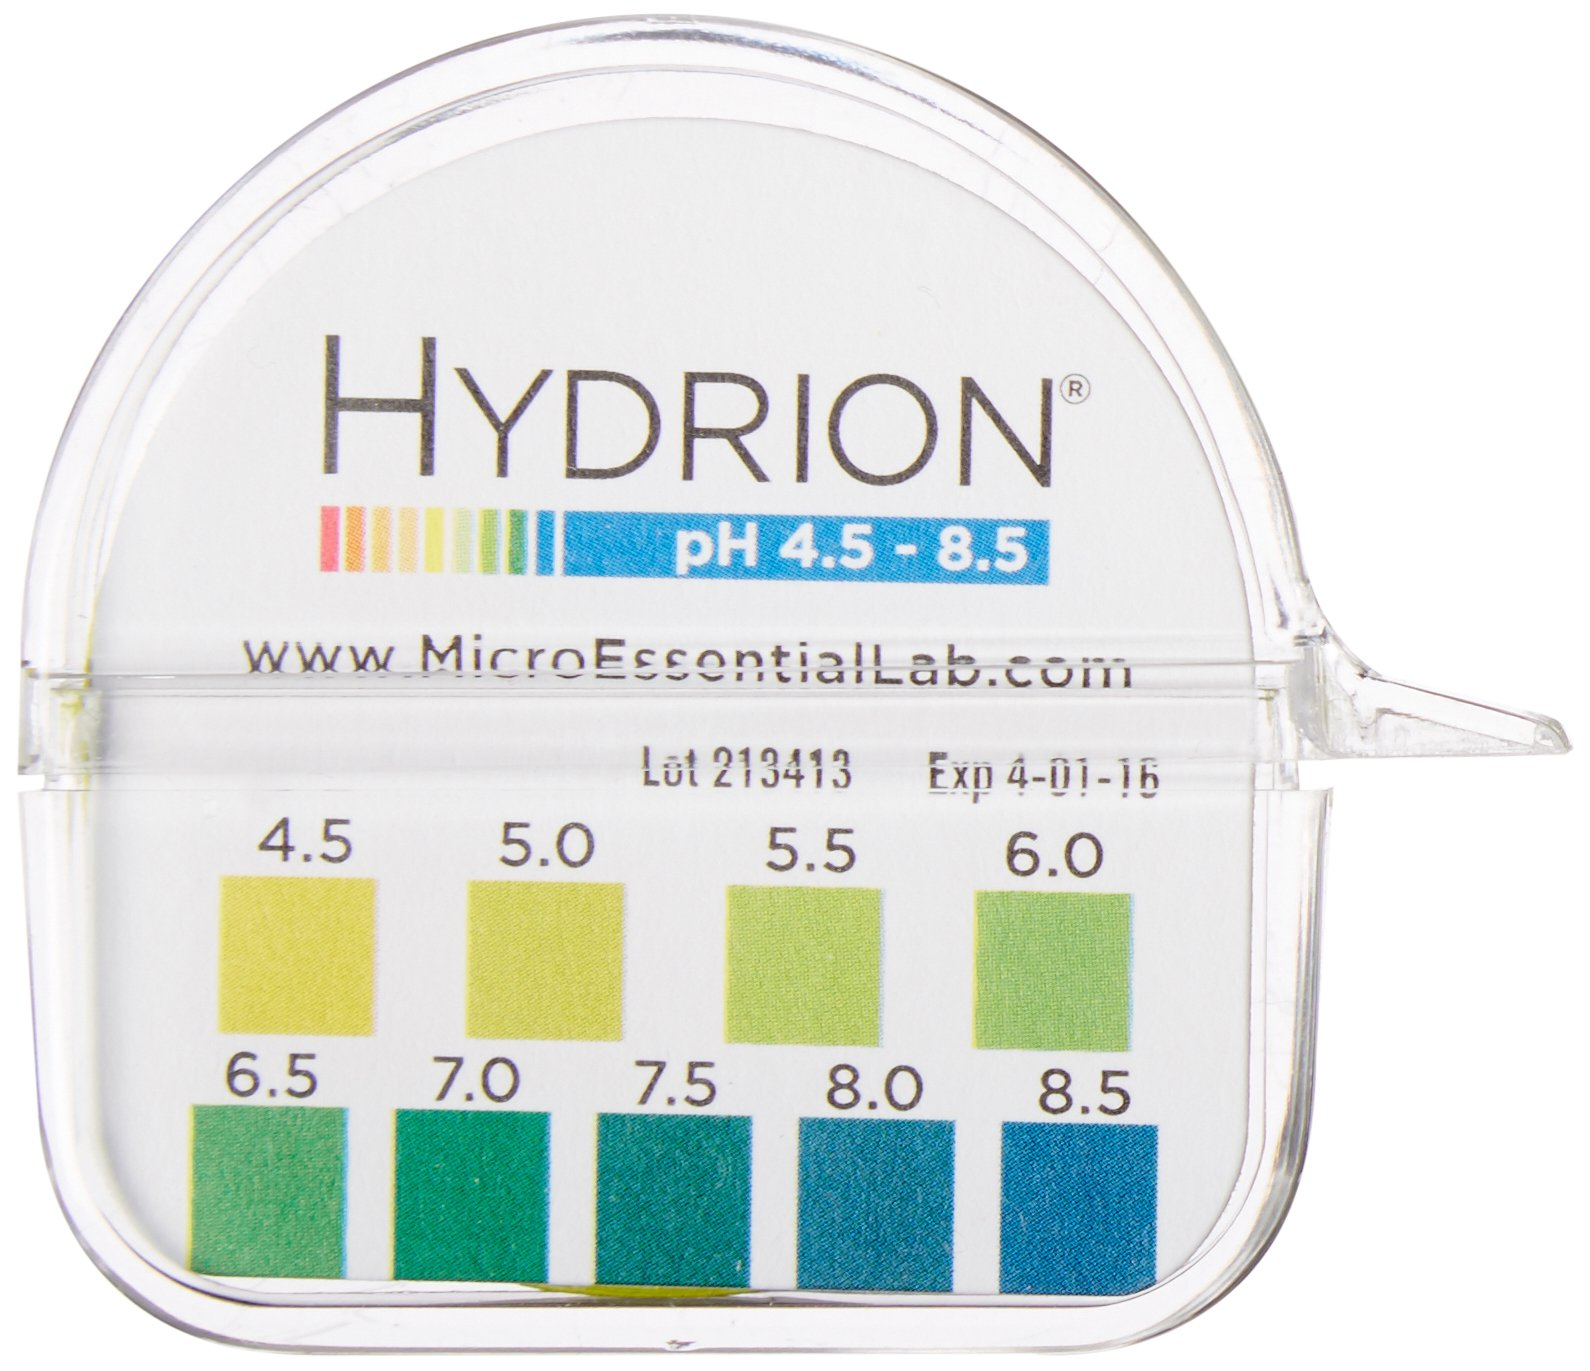 Micro Essential Lab 2210 Plastic Hydrion Vivid Short Range pH Test Paper Dispenser, 4.5-8.5 pH, Single Roll